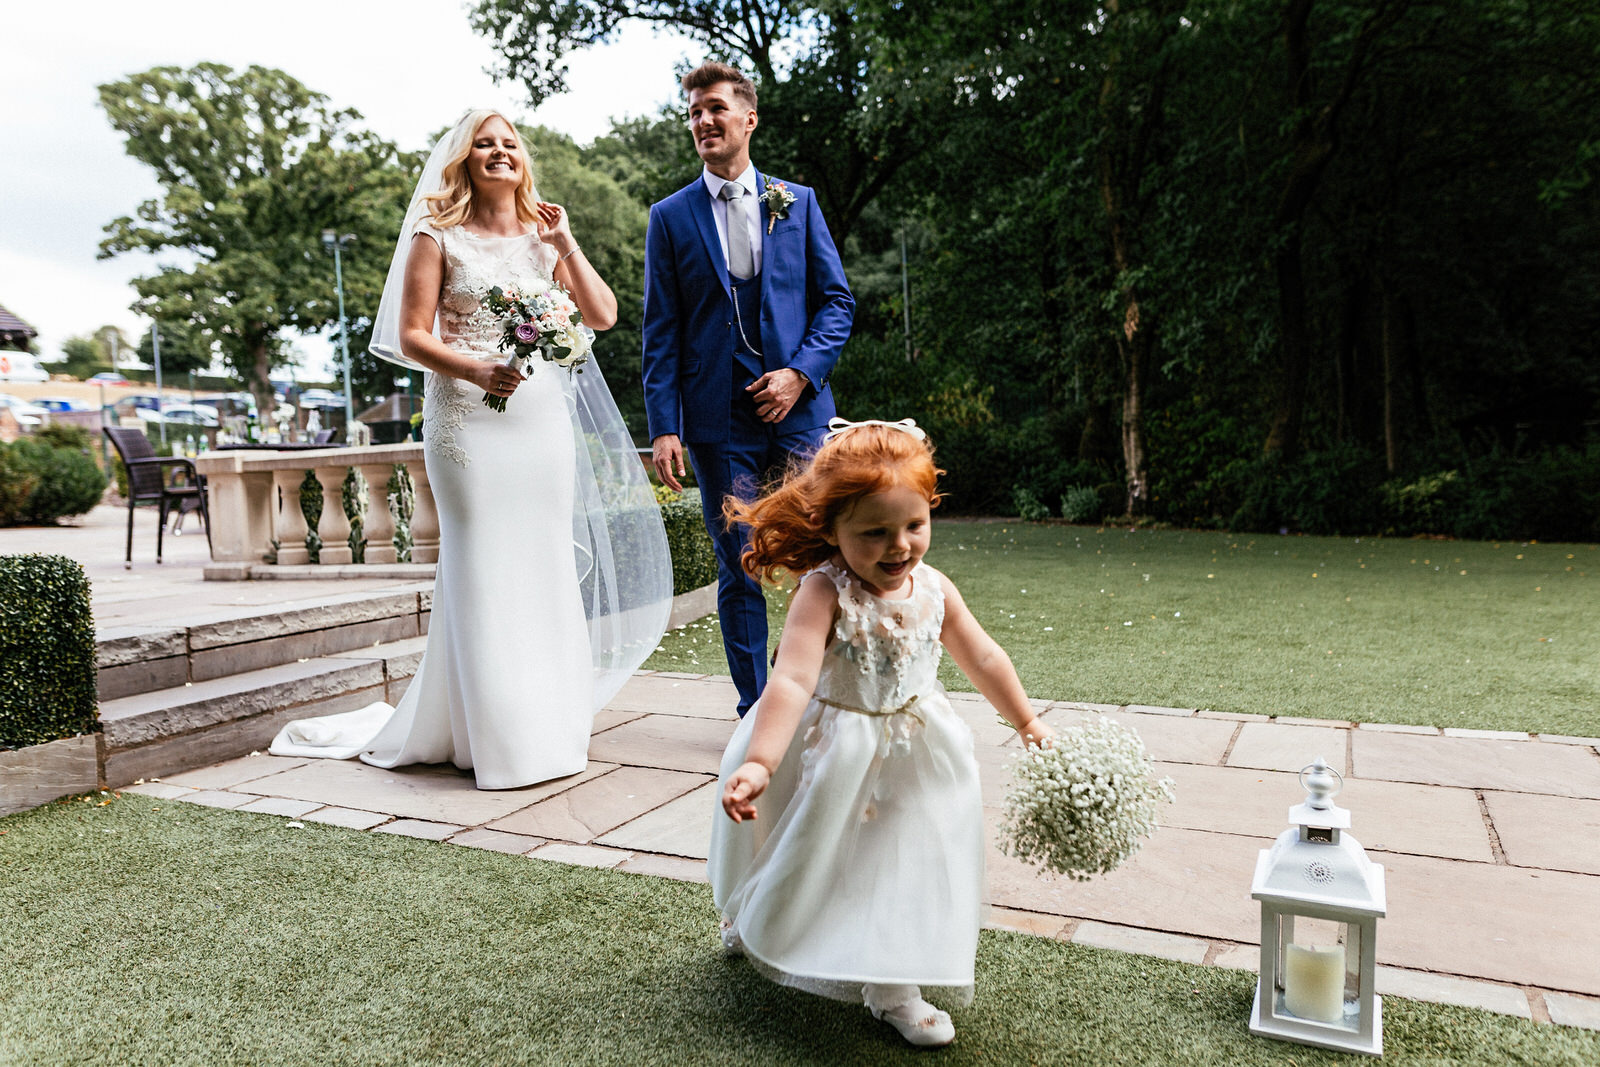 Moddershall-Oaks-Spa-Wedding-Photographer-031.jpg